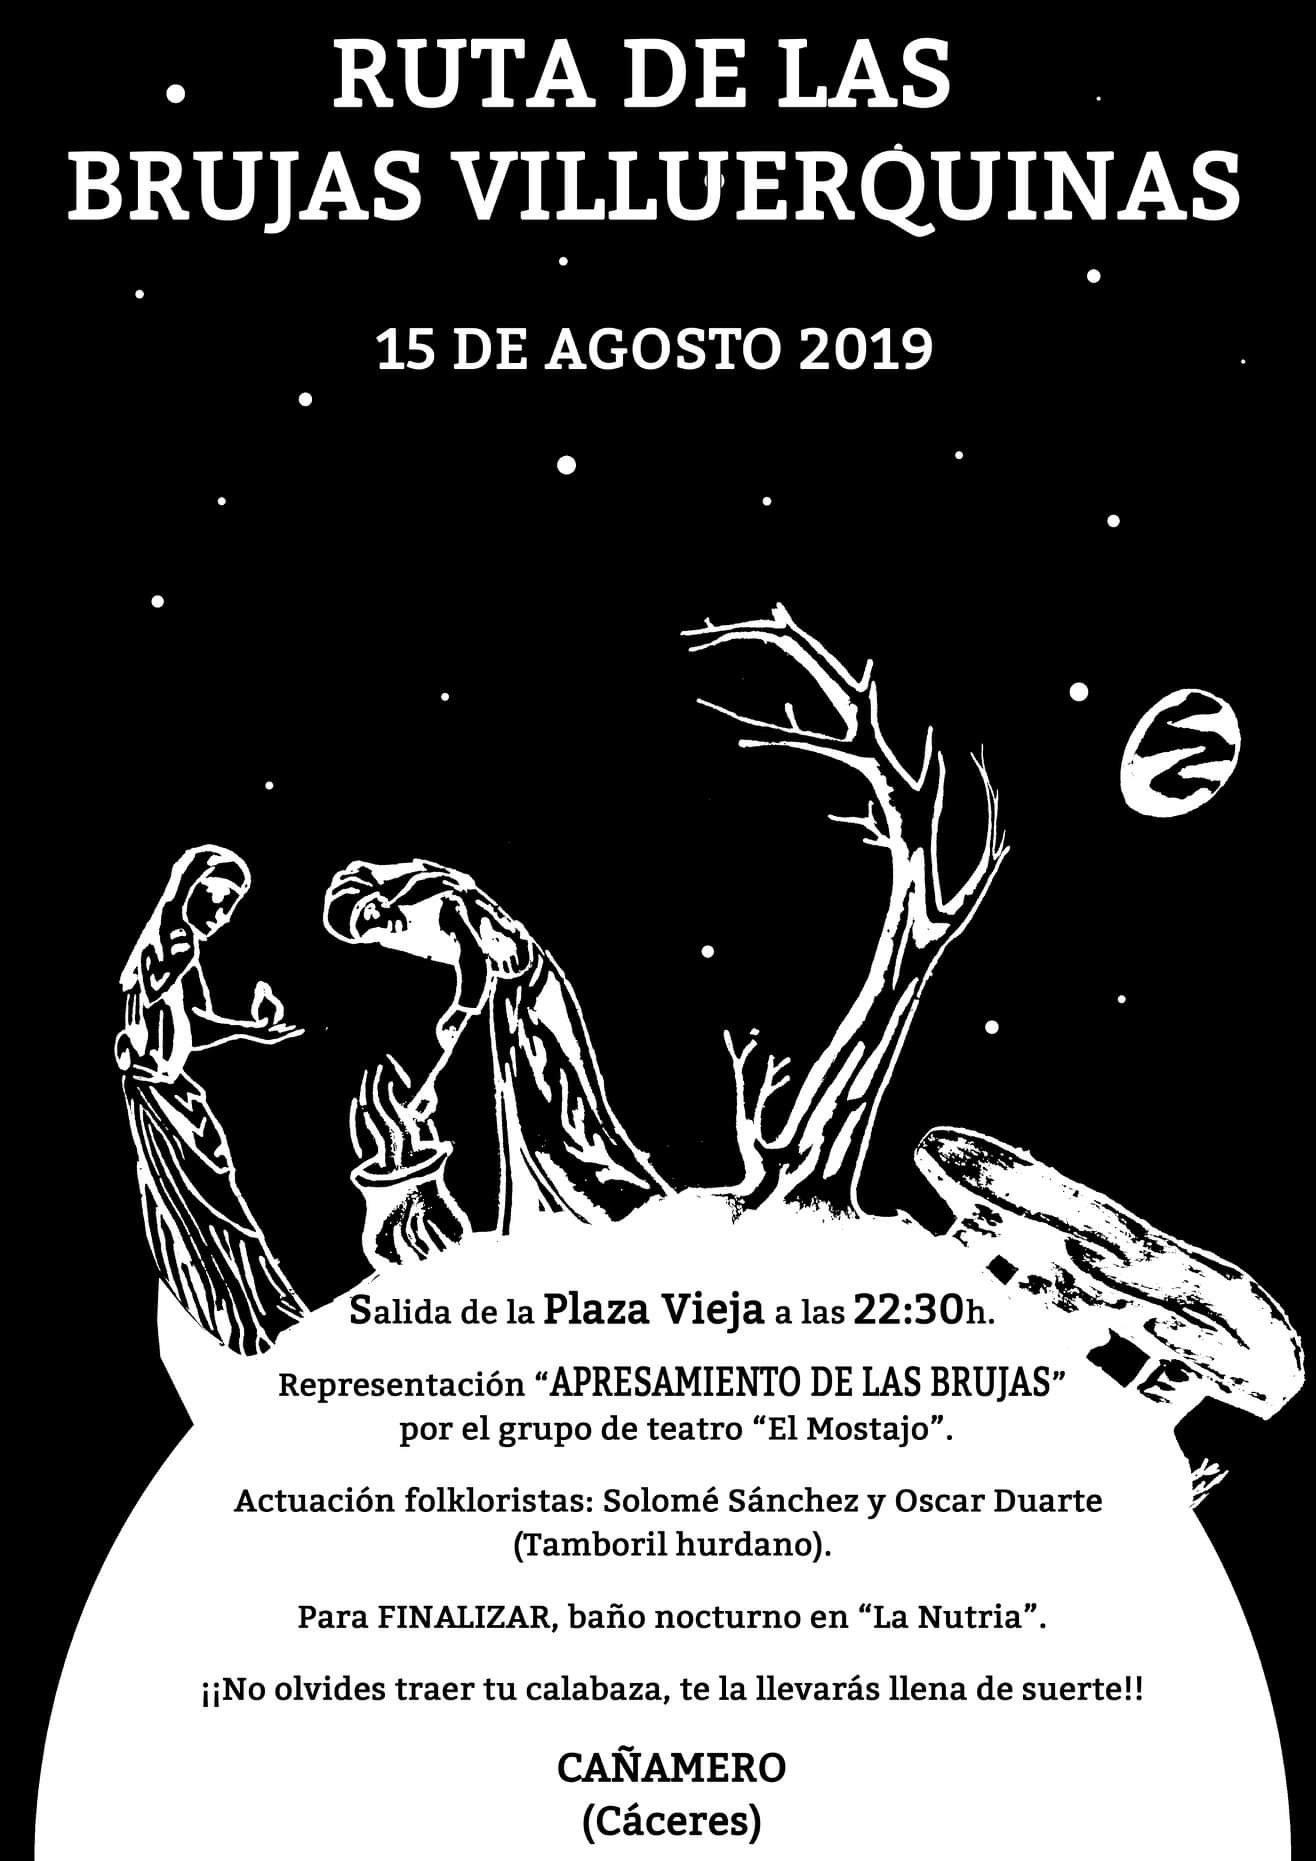 Ruta de las Brujas Villuerquinas 2019 - Cañamero (Cáceres)